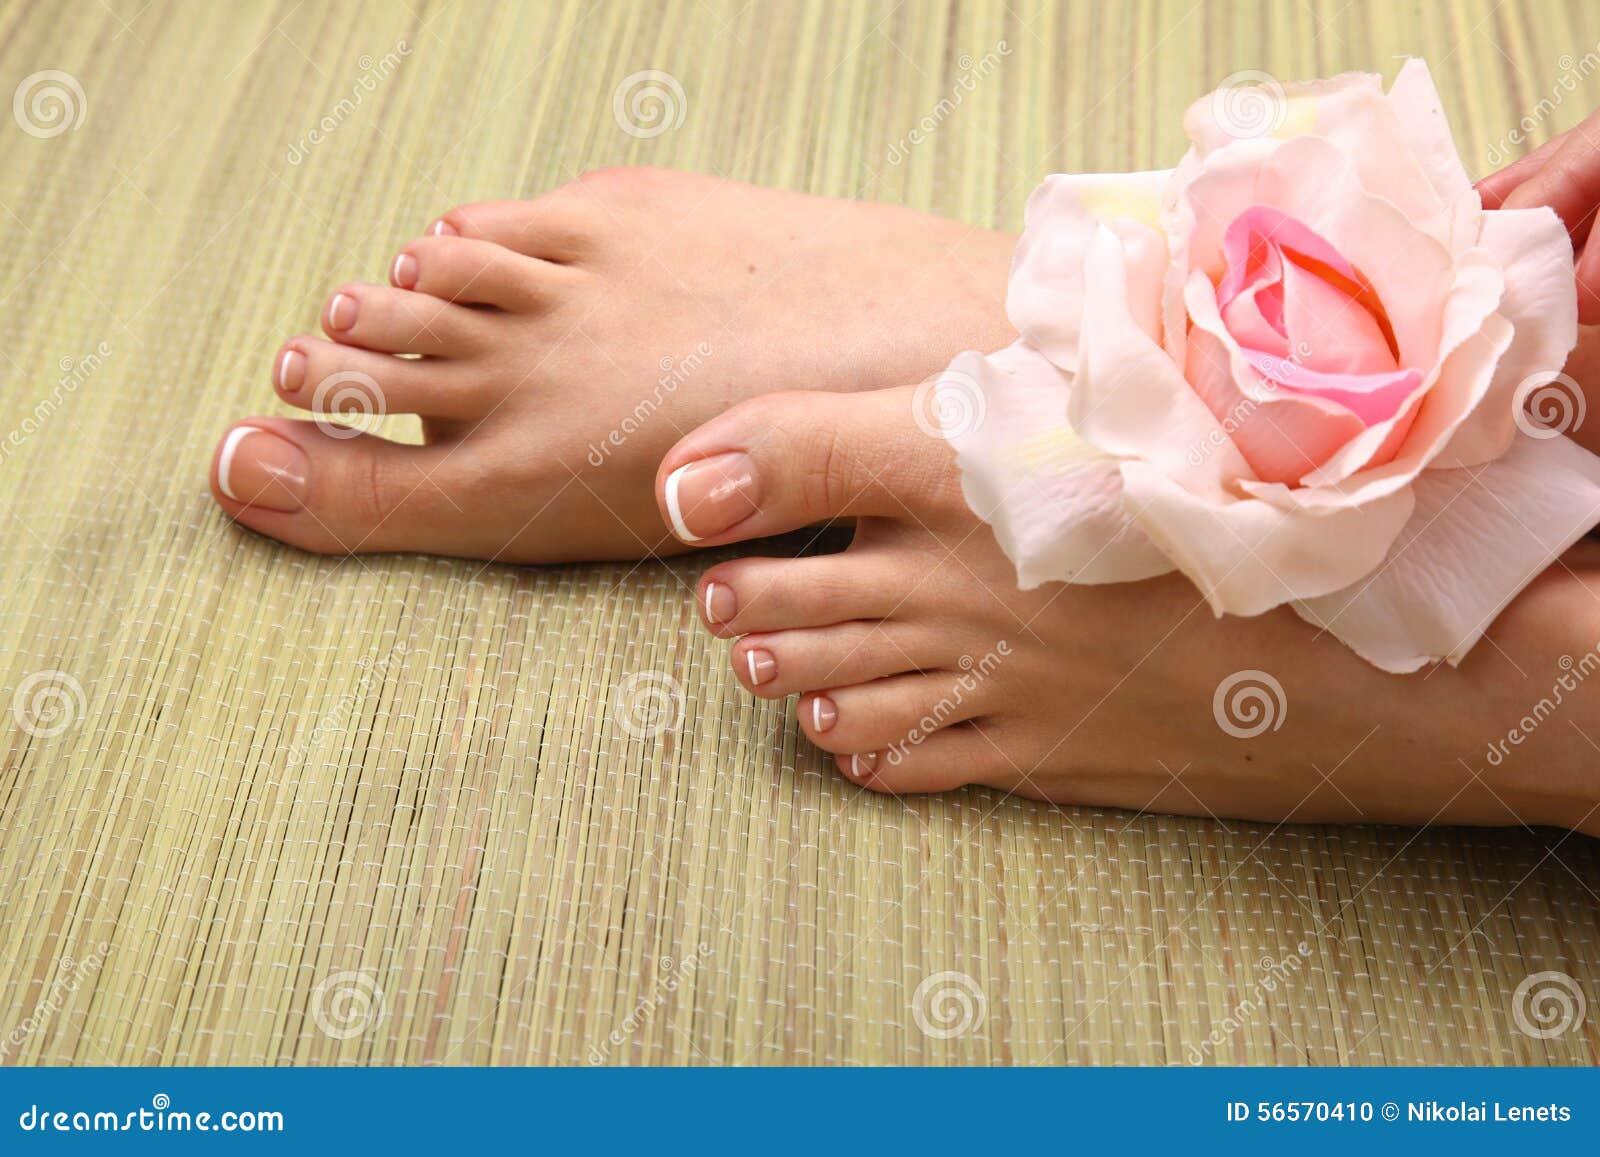 Download Όμορφα πόδια με το τέλειο γαλλικό καρφί SPA Στοκ Εικόνες - εικόνα από σαλόνι, καρφί: 56570410